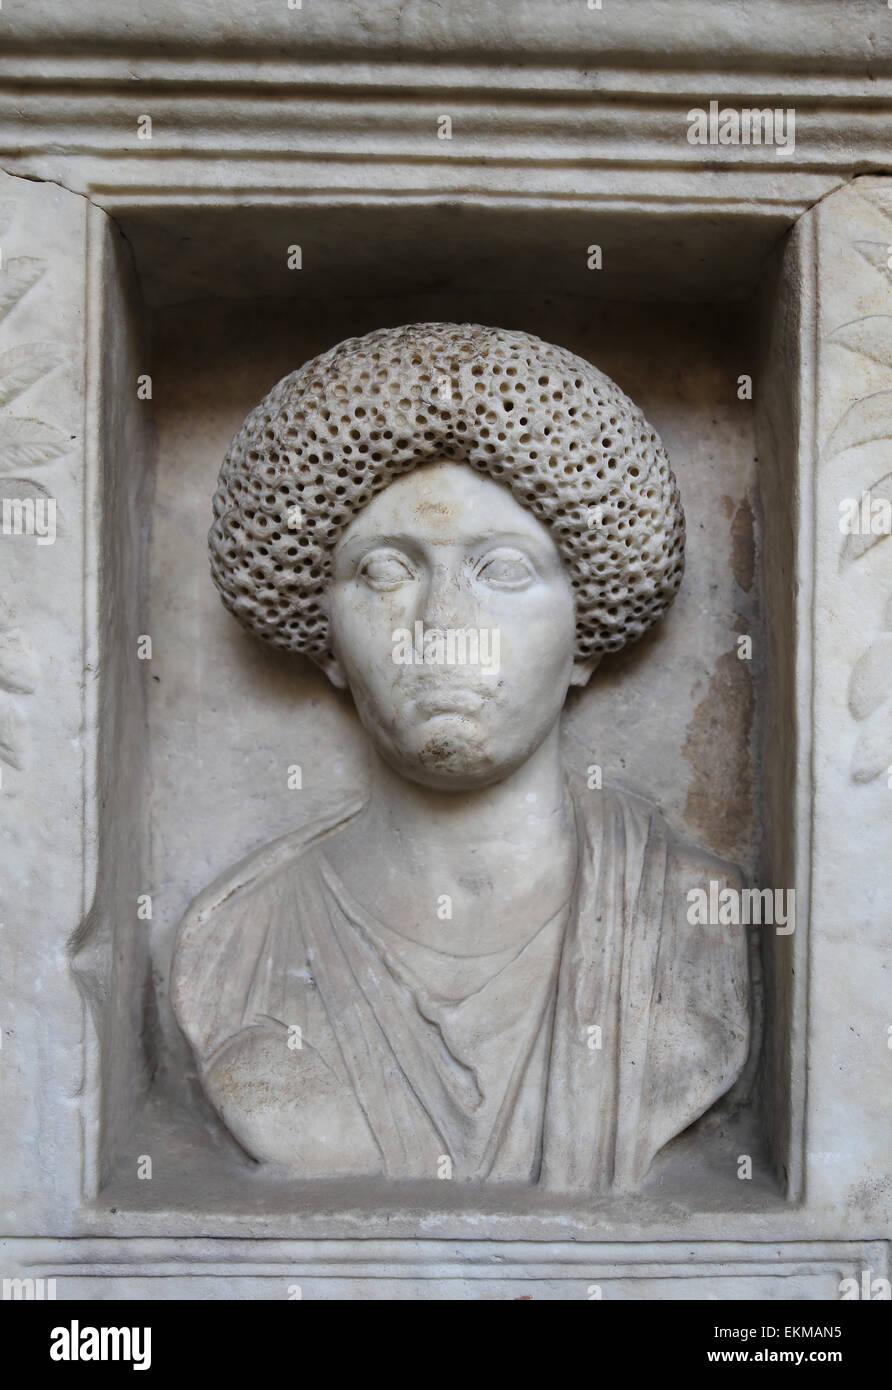 Lápida romana. Mármol. Alivio. Retrato femenino. Museos Vaticanos. Imagen De Stock